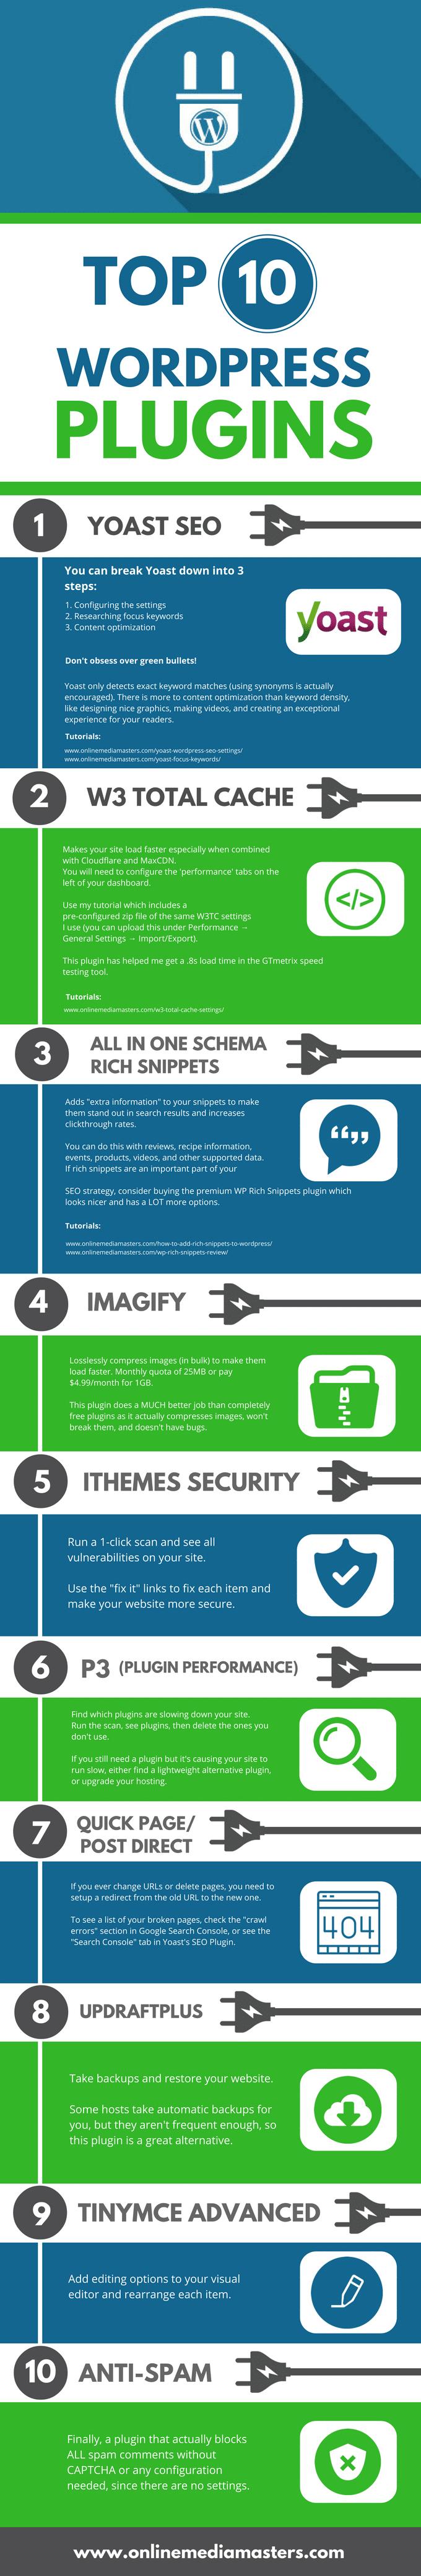 top-10-wordpress-plugins-infographic